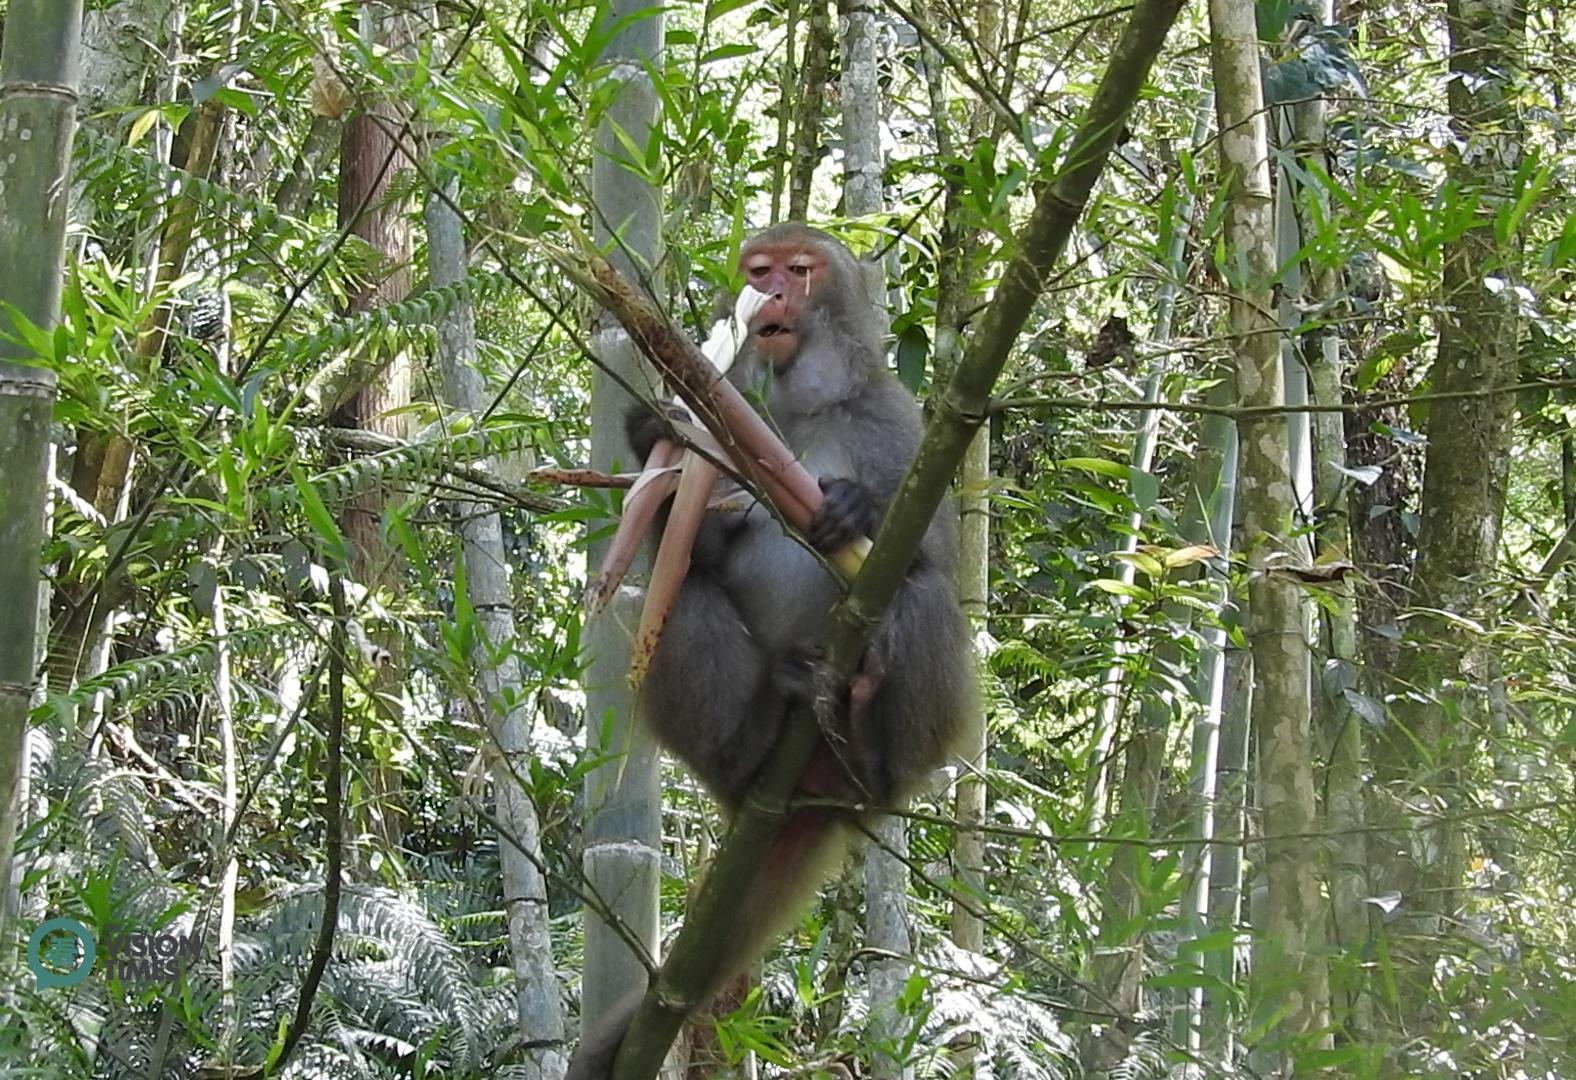 A Formosan macaques enjoys a bamboo shoot at the bamboo forest at Sun Moon Lake. (Image: Julia Fu / Vision Times)